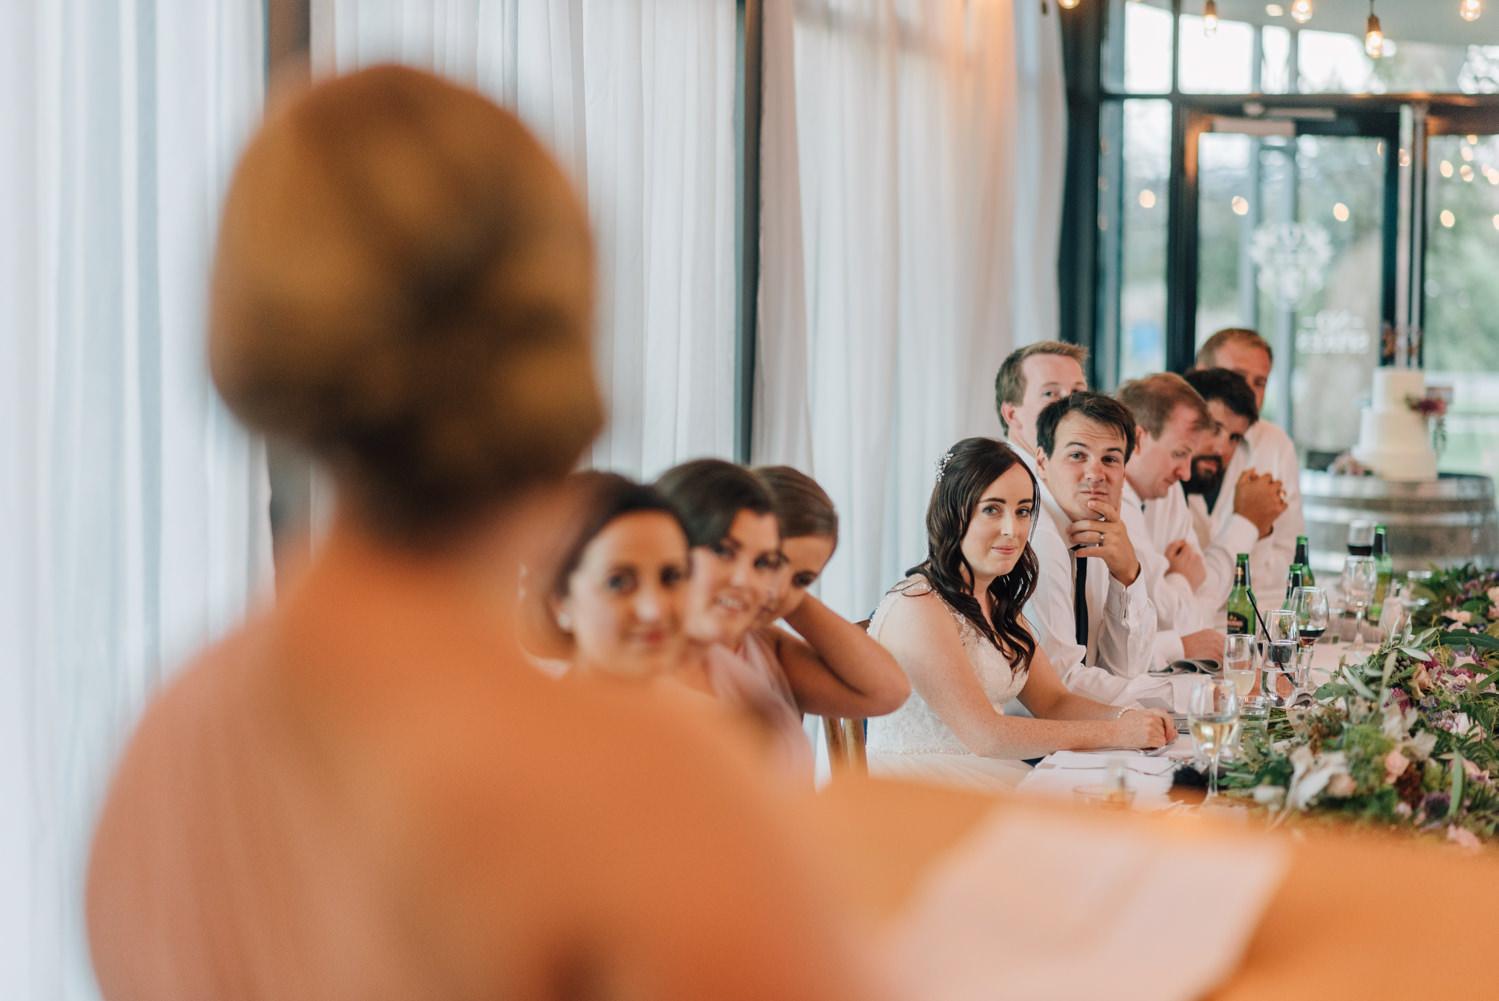 Quamby-Wedding-Photographer-145.jpg